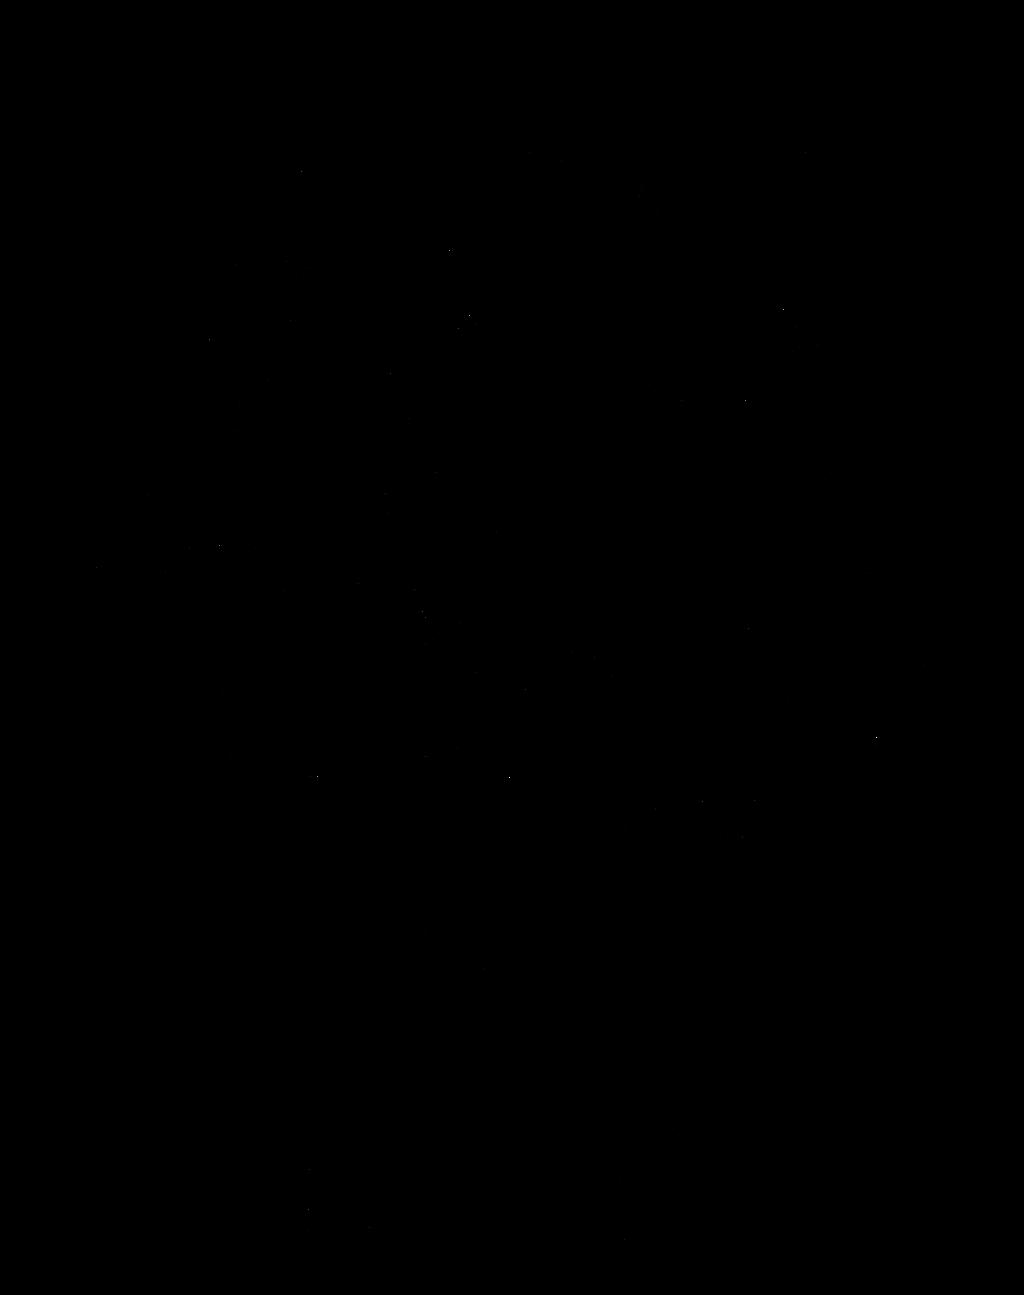 chibi lucy lineart by mmdlucyextend on deviantart